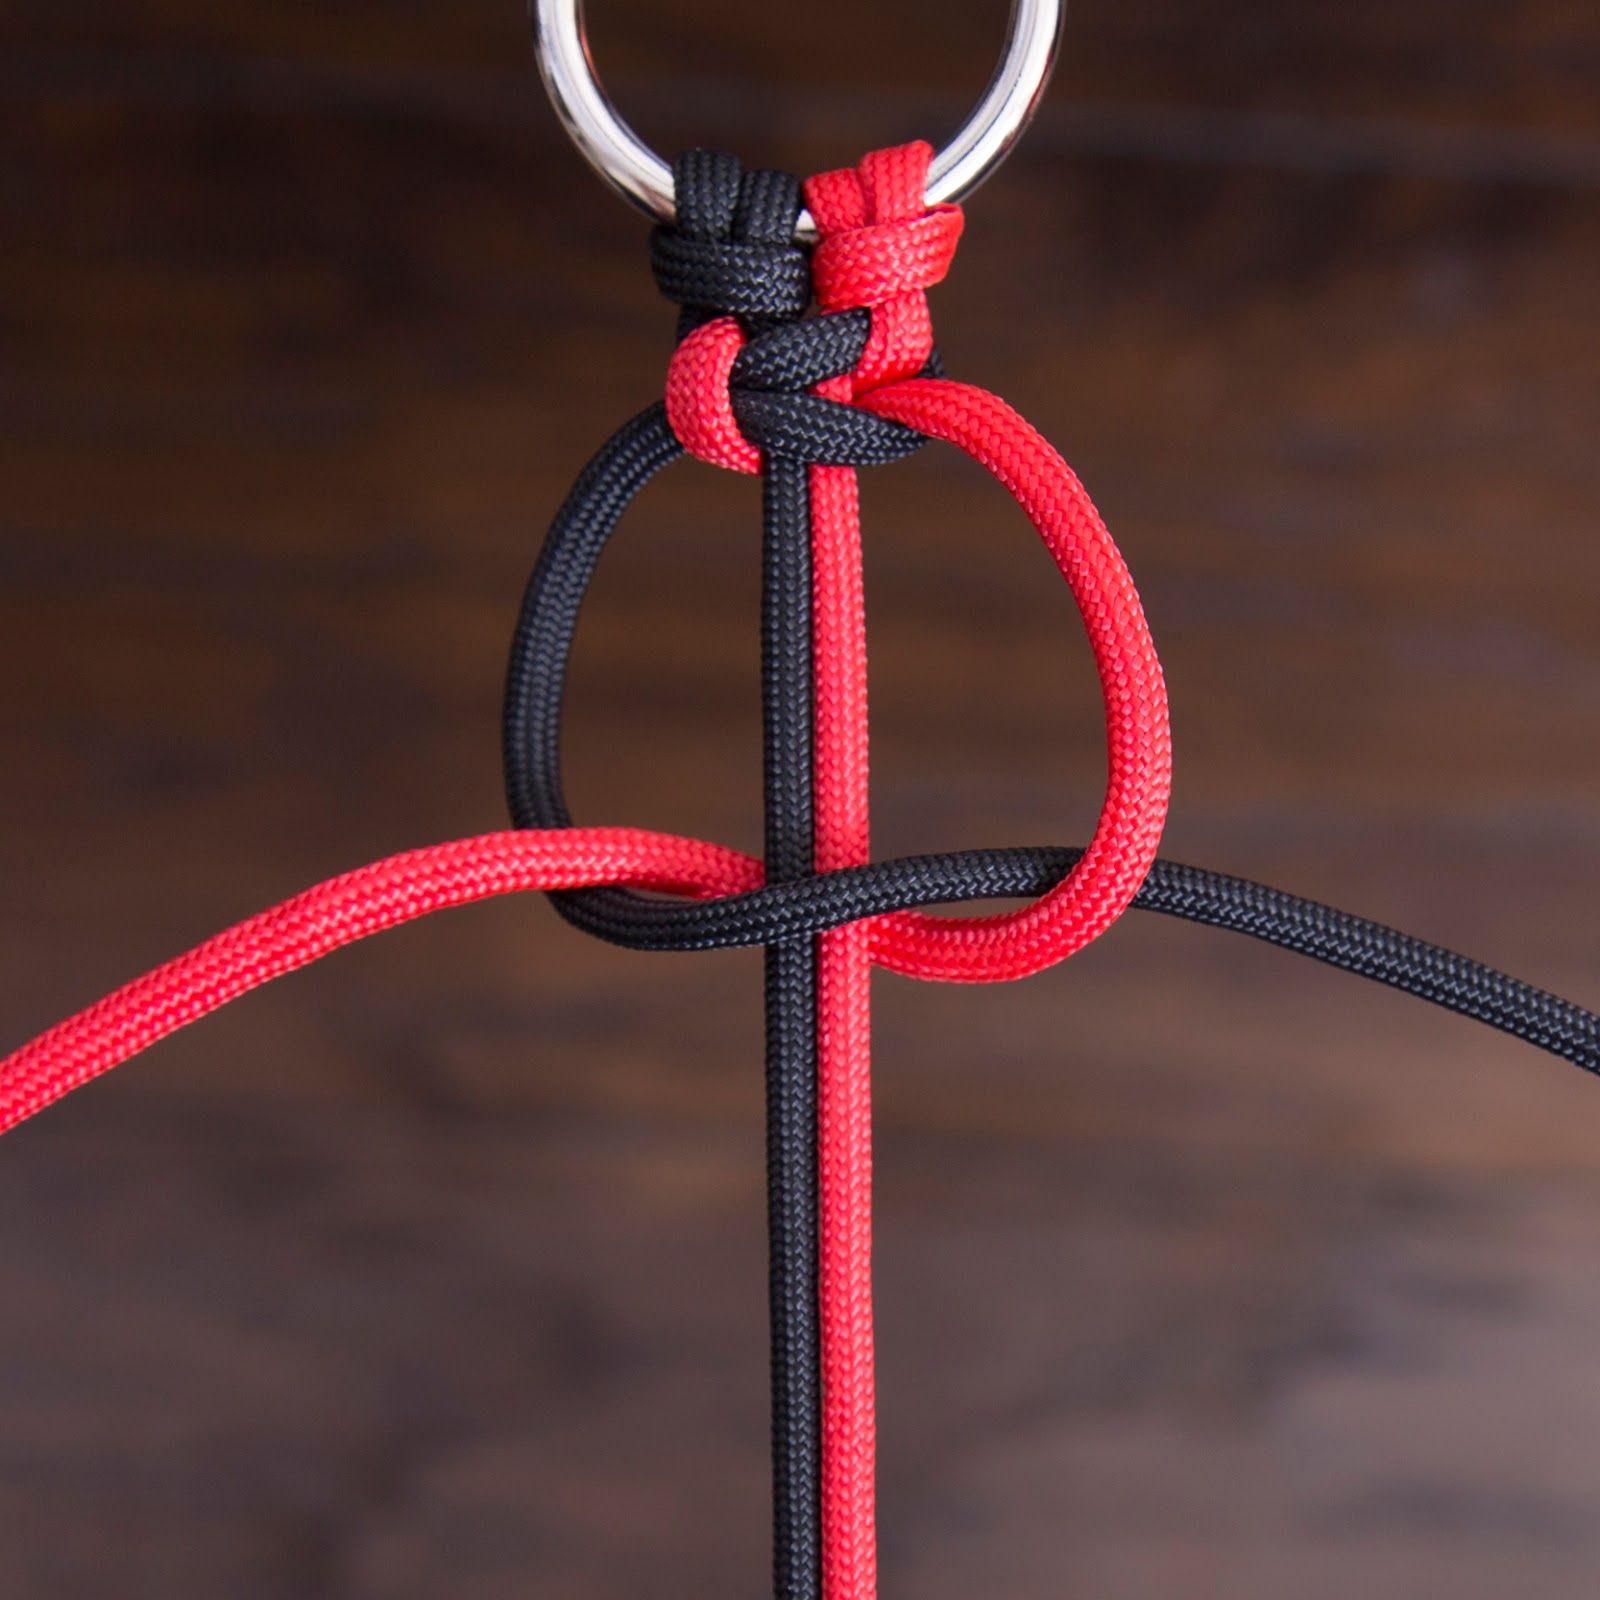 Favorit Solomon, Weberknoten, Survival, Armband, Halsband, Hund, Leine AB98